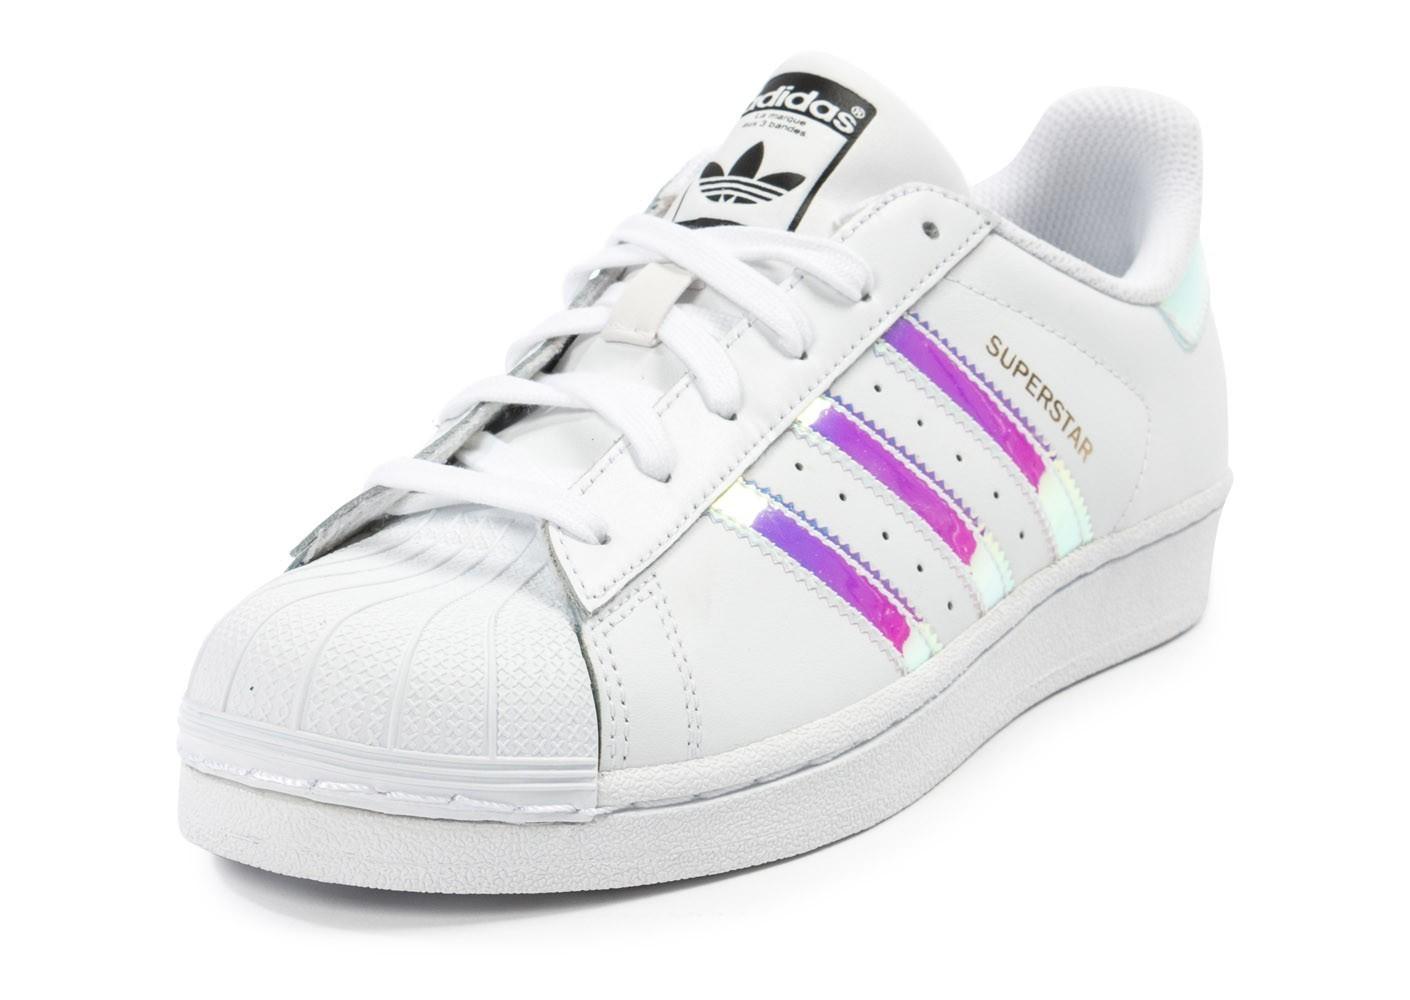 superstar brillante adidas,Chaussures & vêtements Adidas pas cher